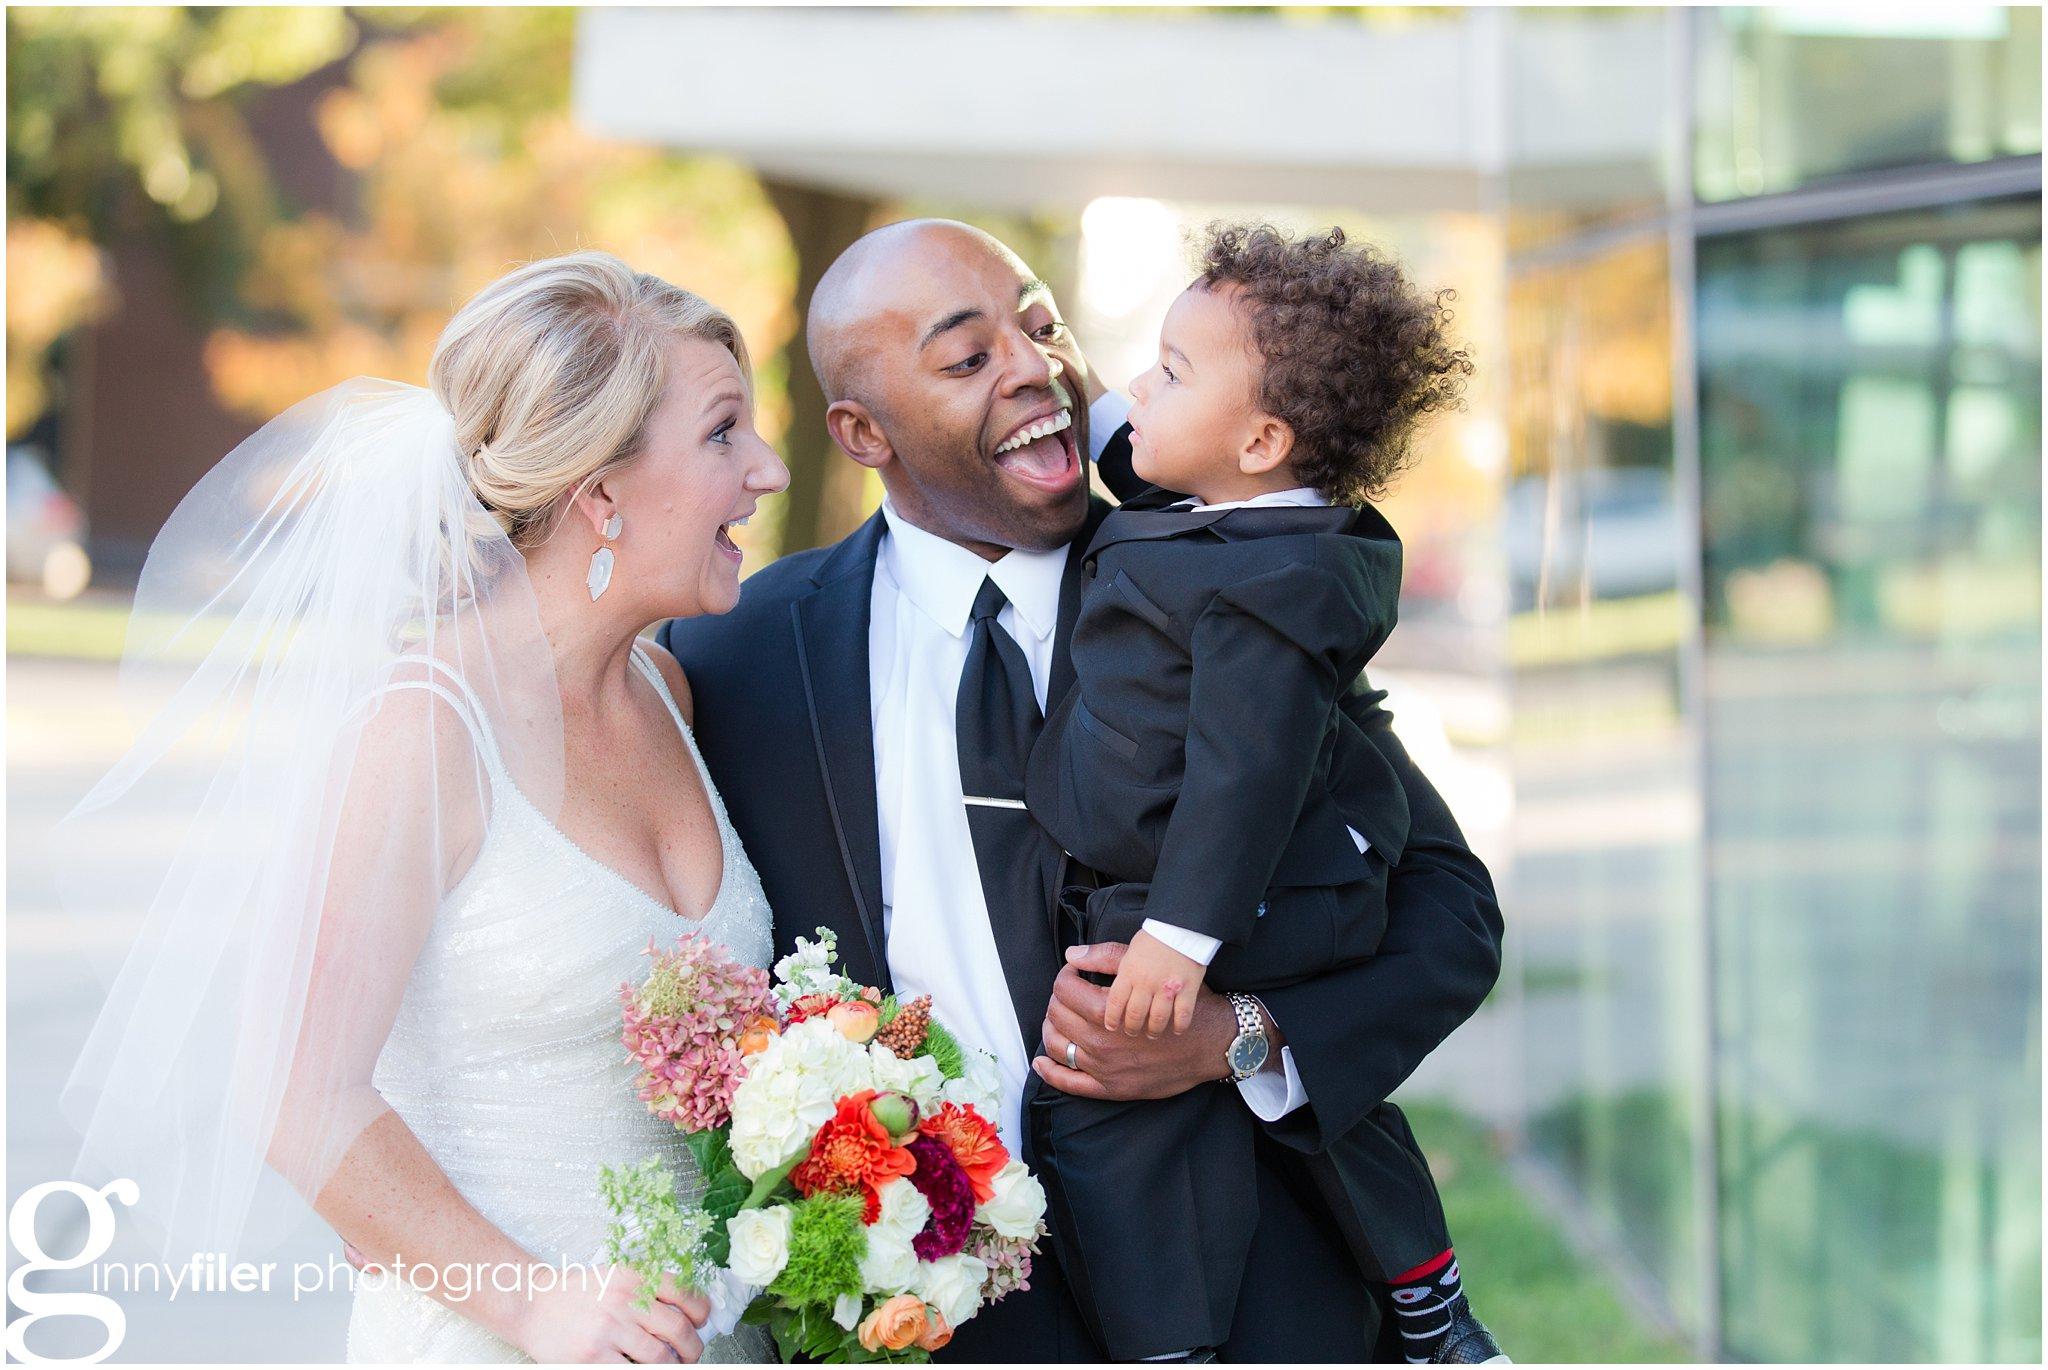 wedding_photography_bobb_0011.jpg